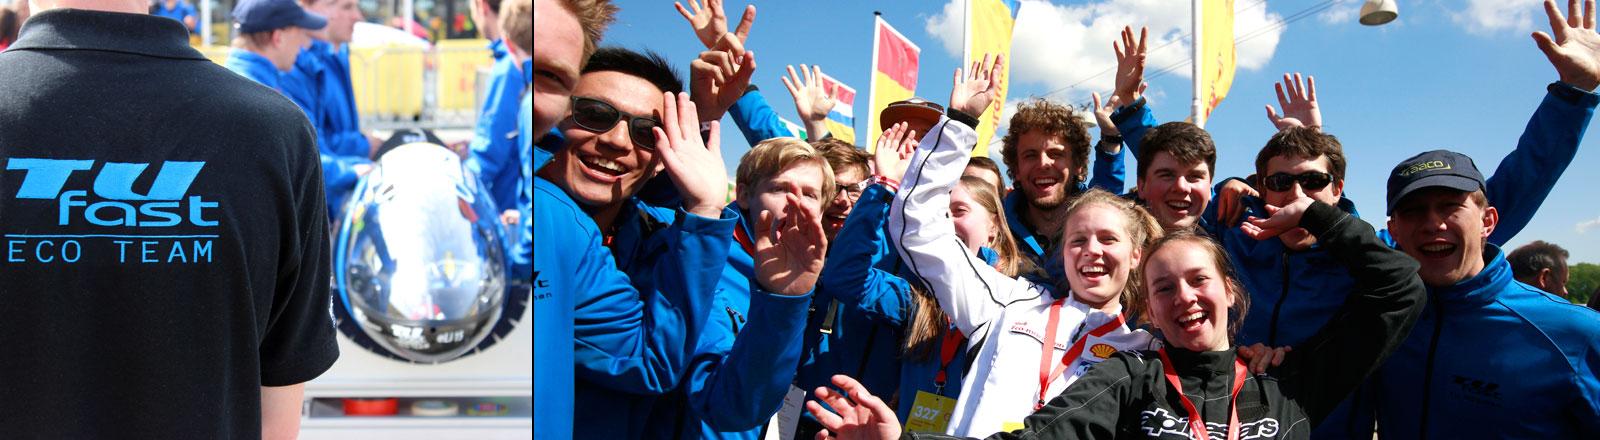 TUfast Eco Team beim Eco-Marathon 2015